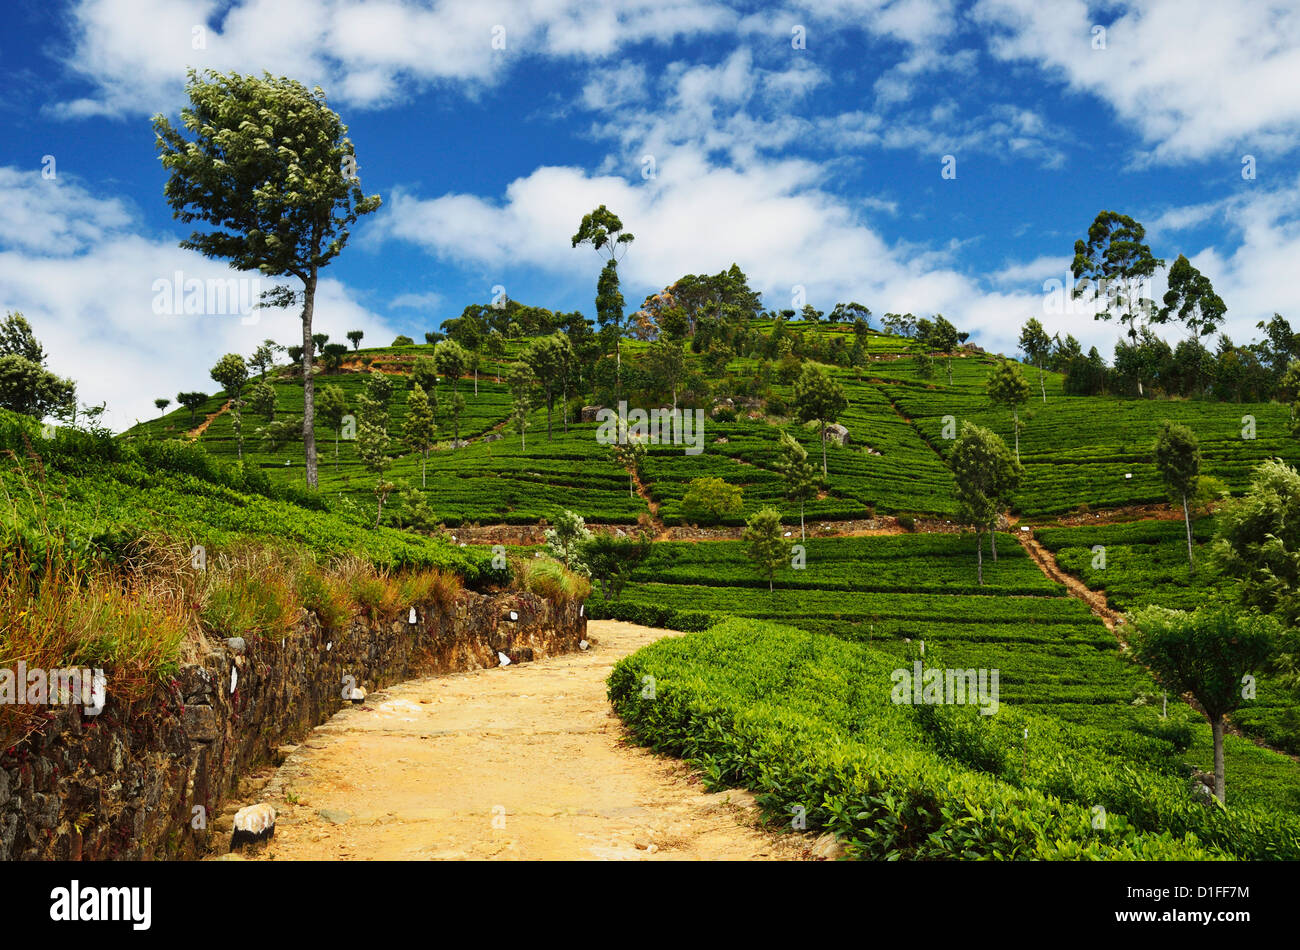 Vista de las plantaciones de té de Lipton del asiento, Haputale, Sri Lanka, Asia Imagen De Stock